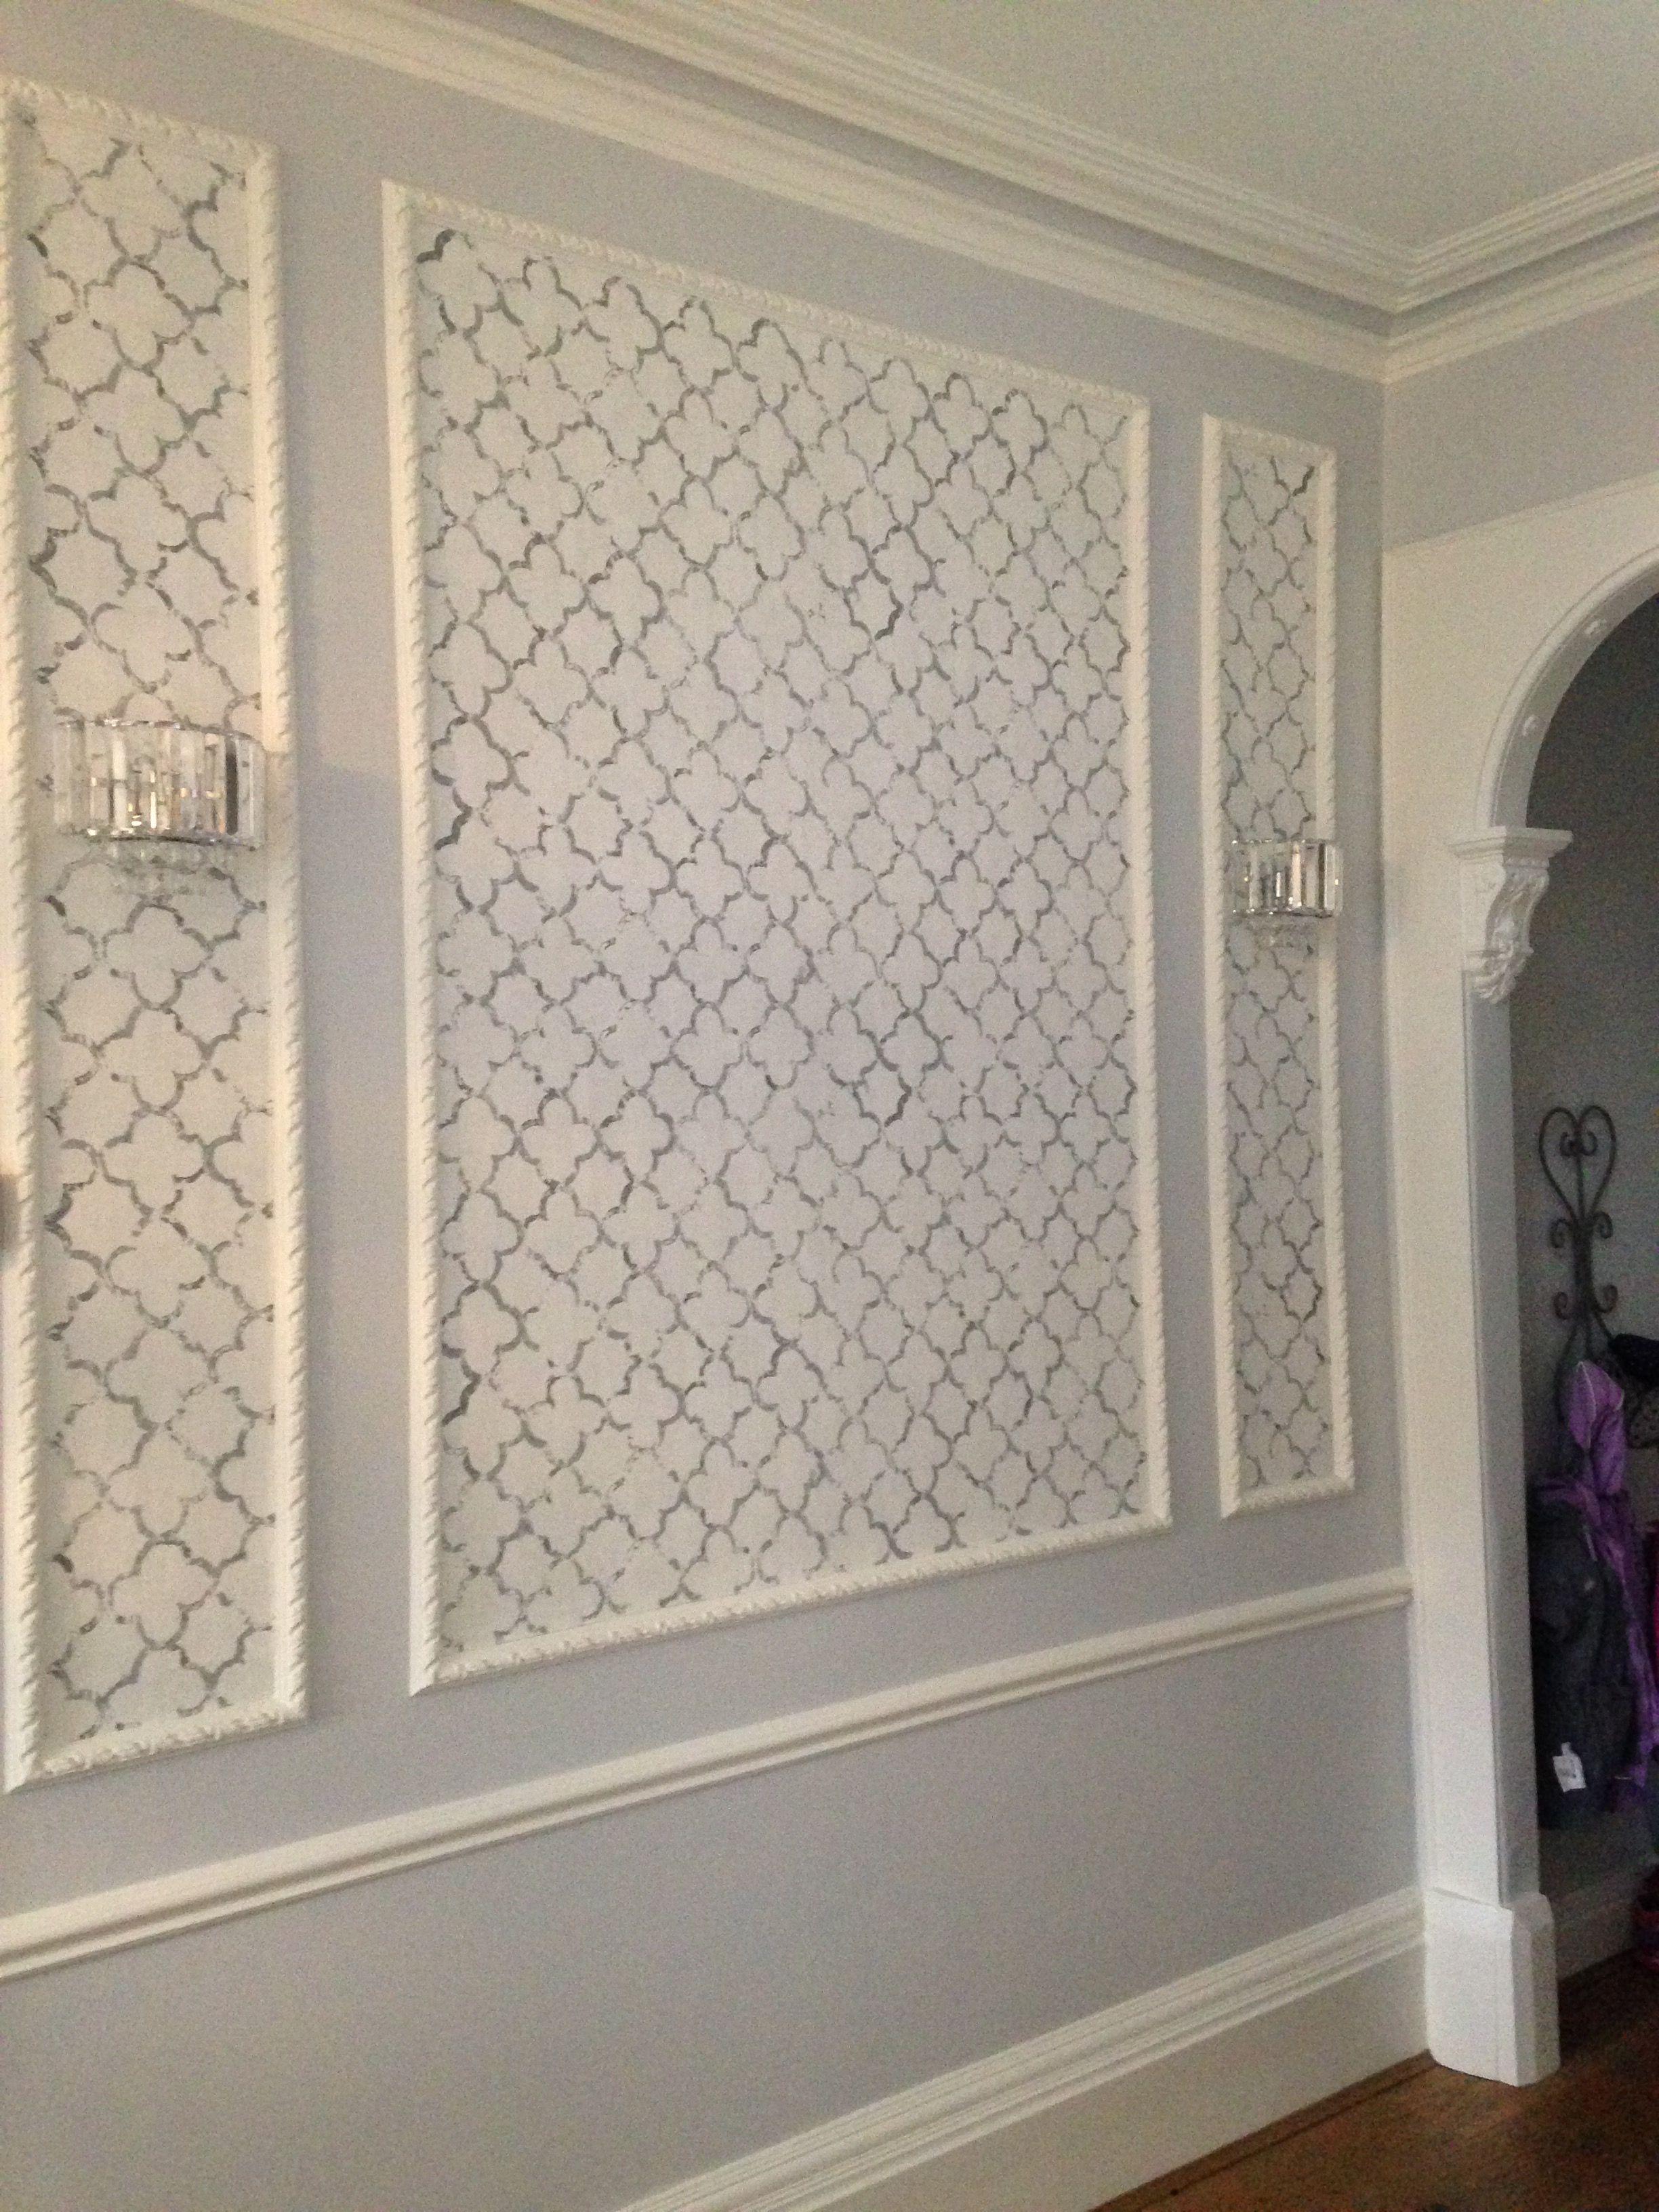 result also bedroom images bedroomproject living room in pinterest rh